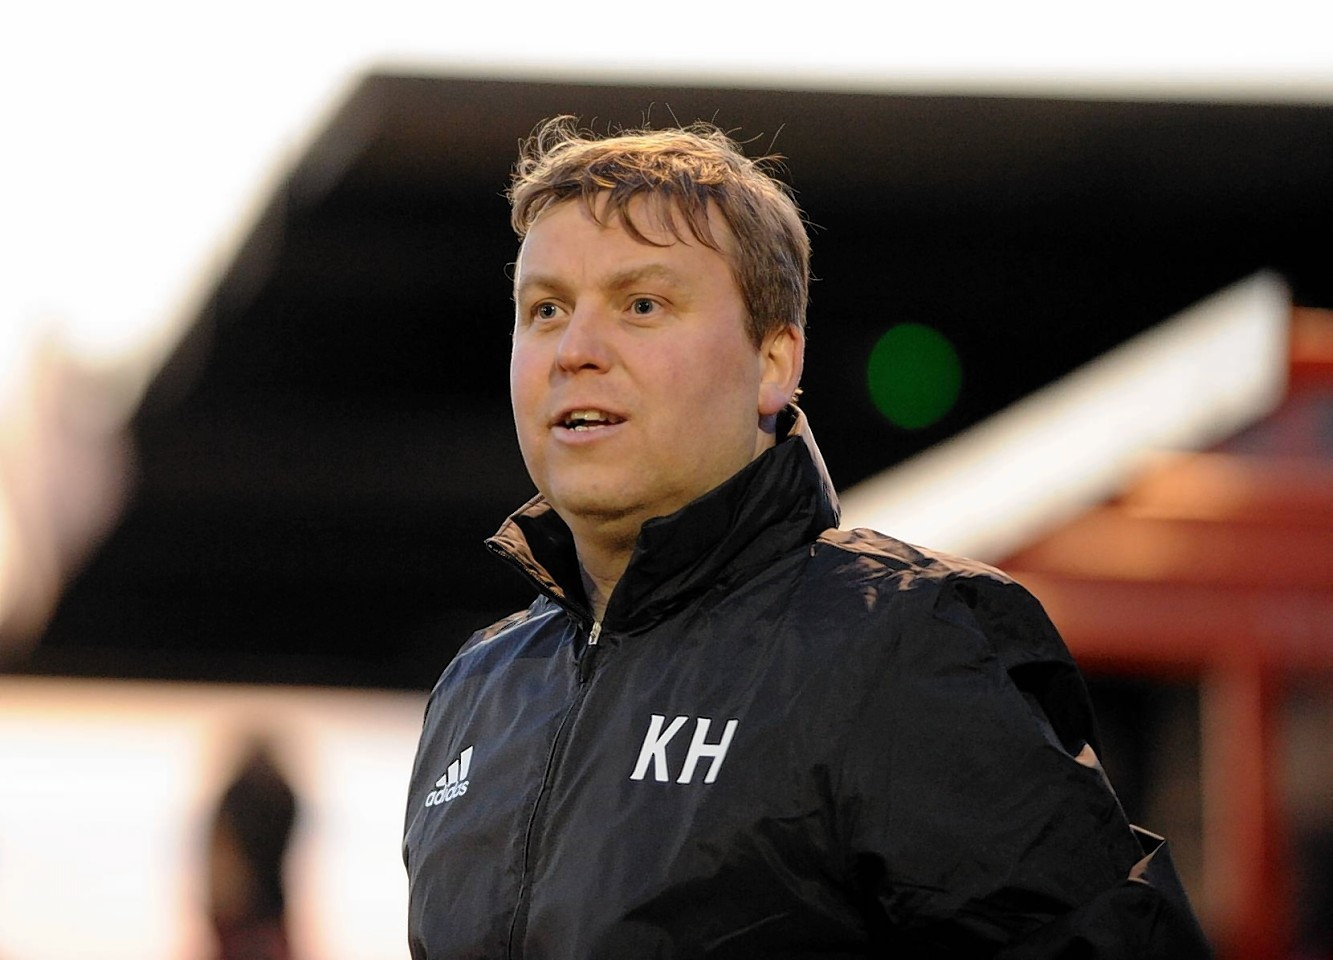 Formartine manager Kris Hunter